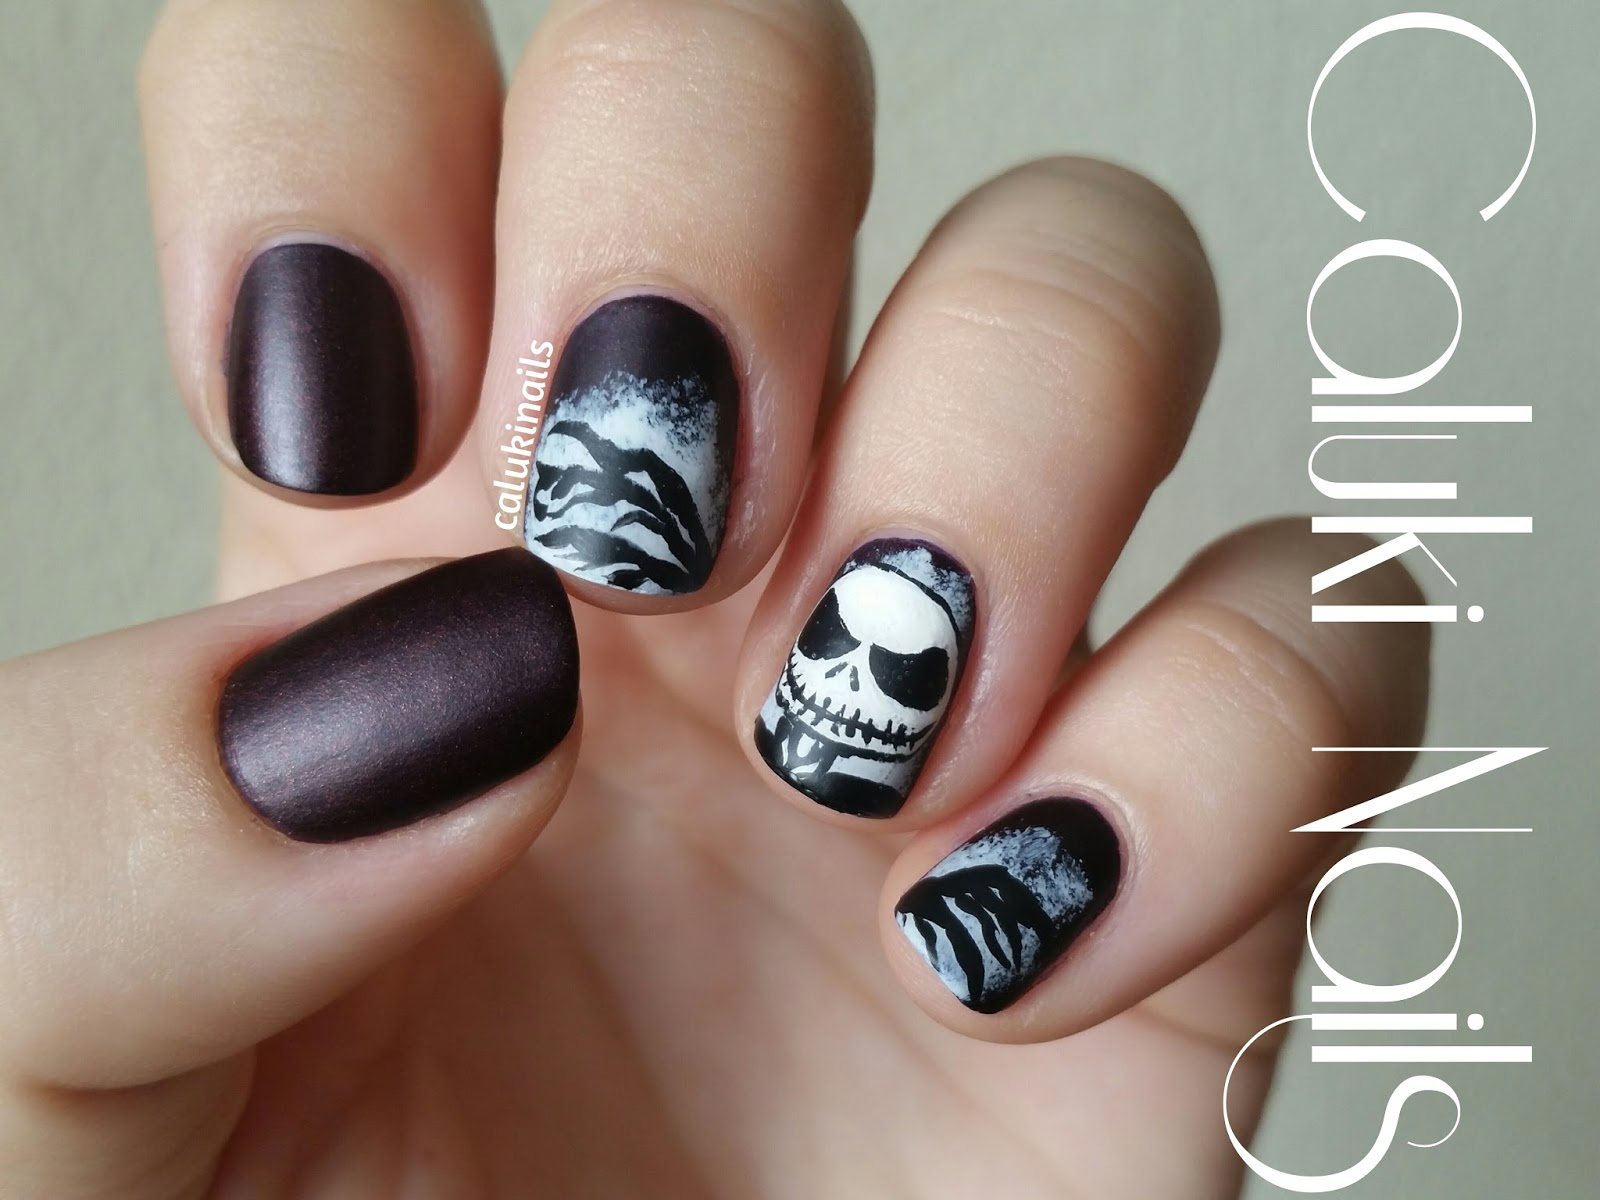 Caluki Nails : Nail art Jack Skellington | Velvet Matt IsaDora